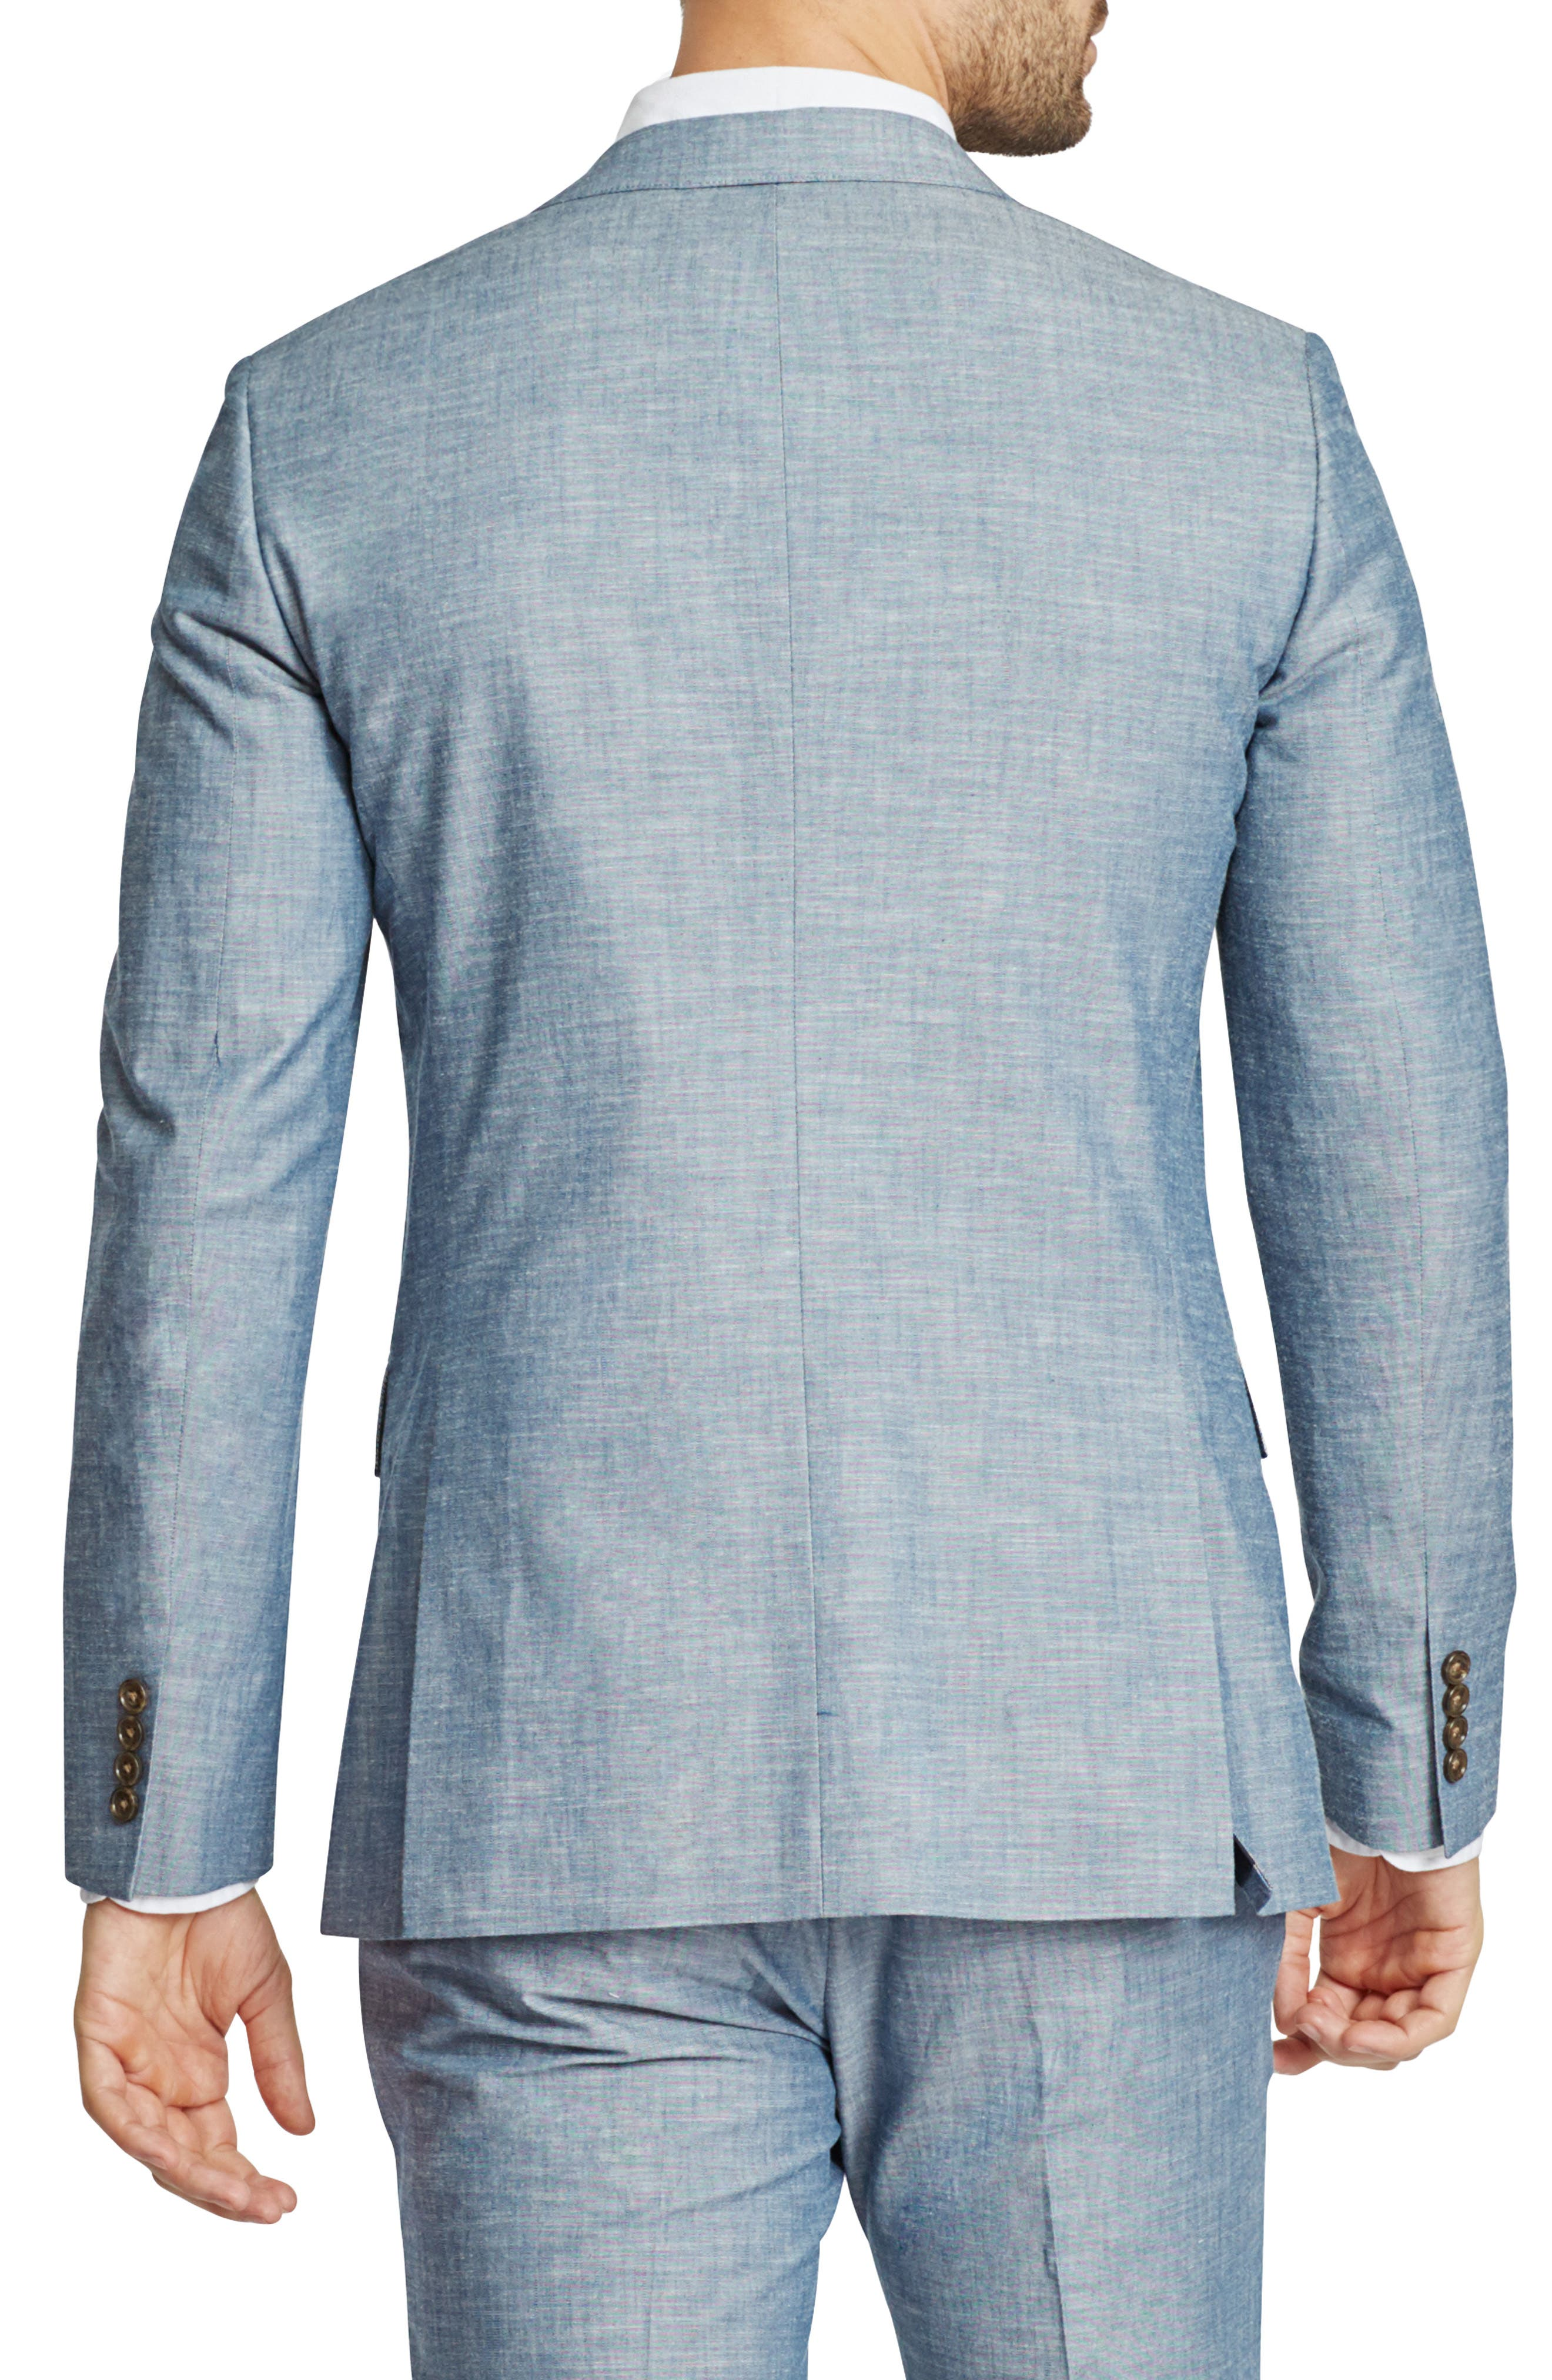 Trim Fit Chambray Cotton Blazer,                             Alternate thumbnail 2, color,                             SOLID BLUE